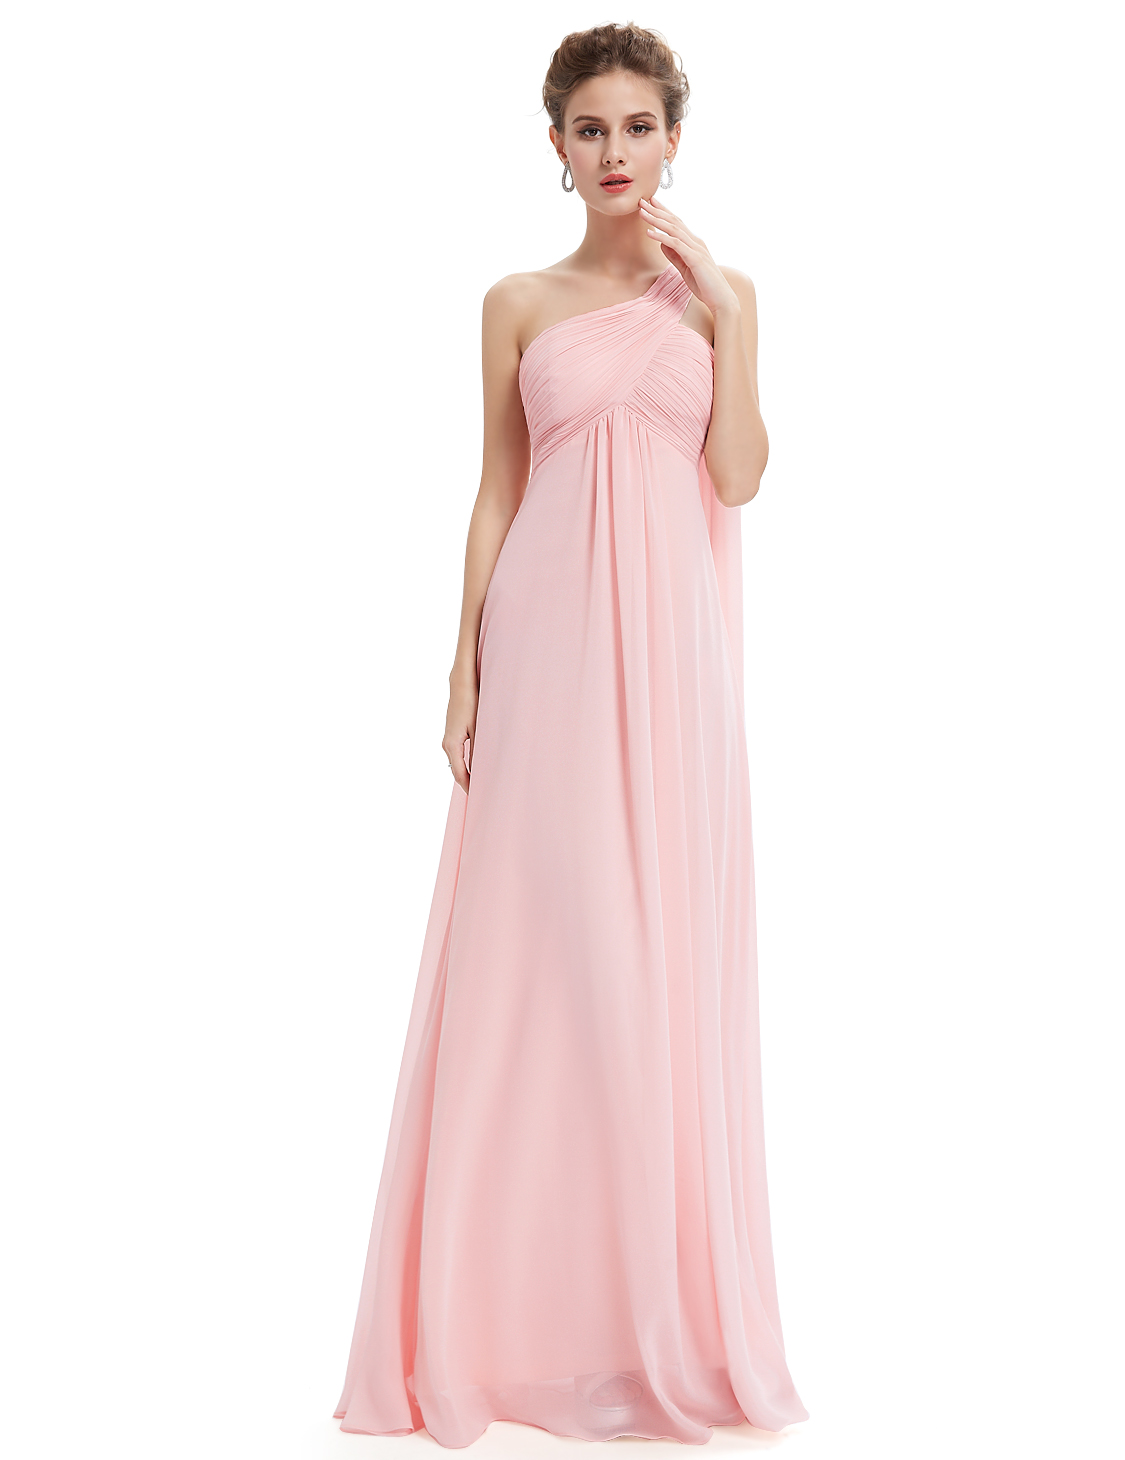 Ever-Pretty-Bridesmaid-Dresses-Chiffon-Ribbon-Long-Formal-Cocktail-Party-Dress thumbnail 24